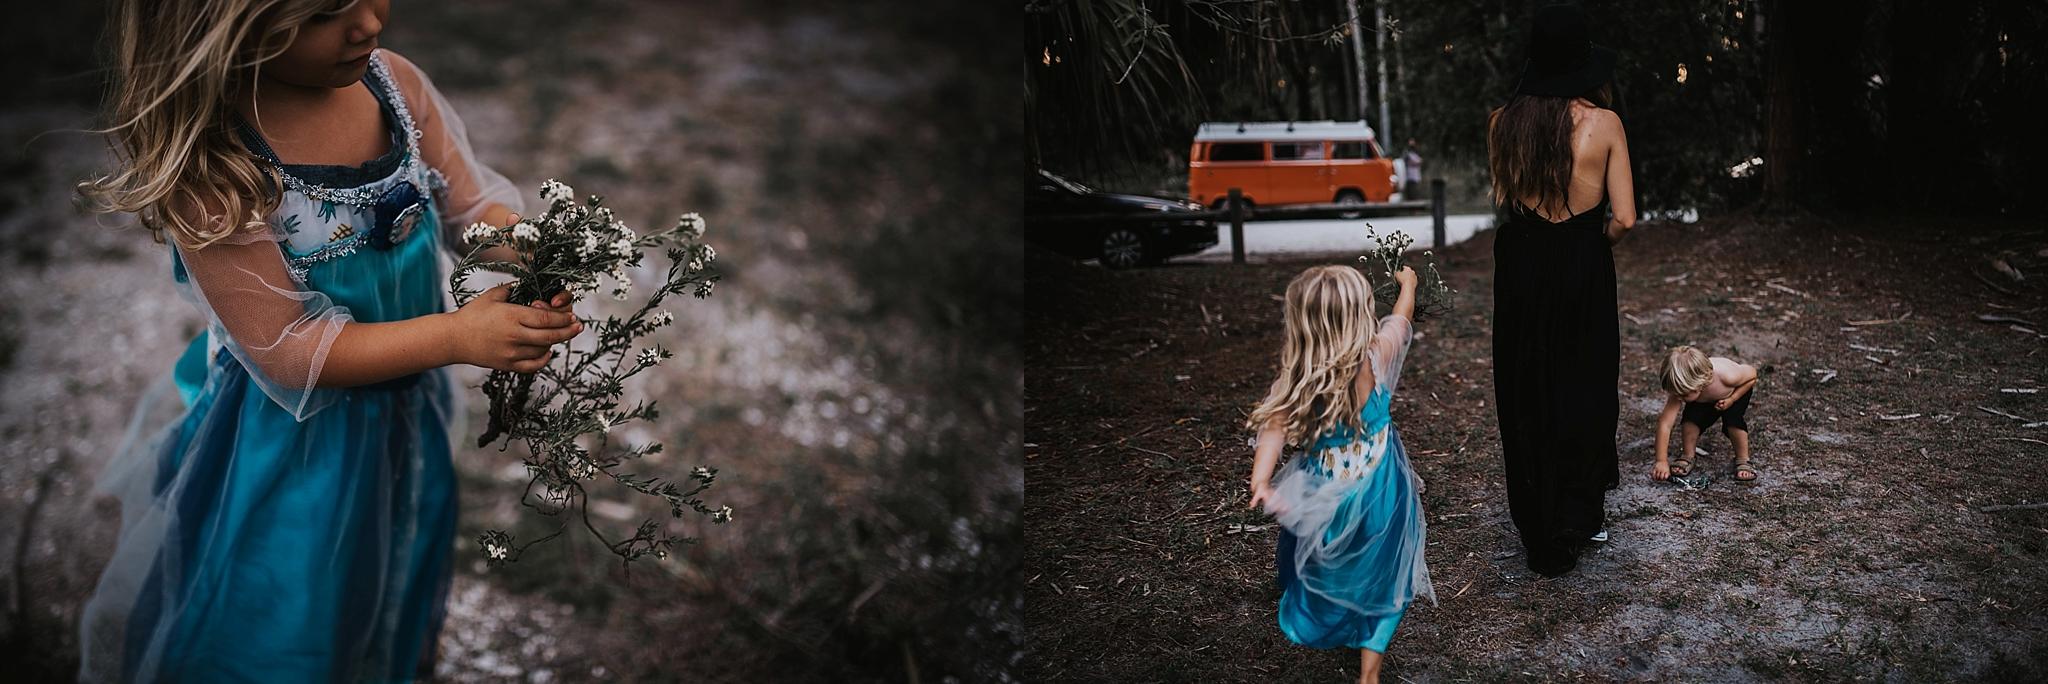 twyla jones photography - treasure coast - florida family photography riverbend park jupiter florida-6276.jpg